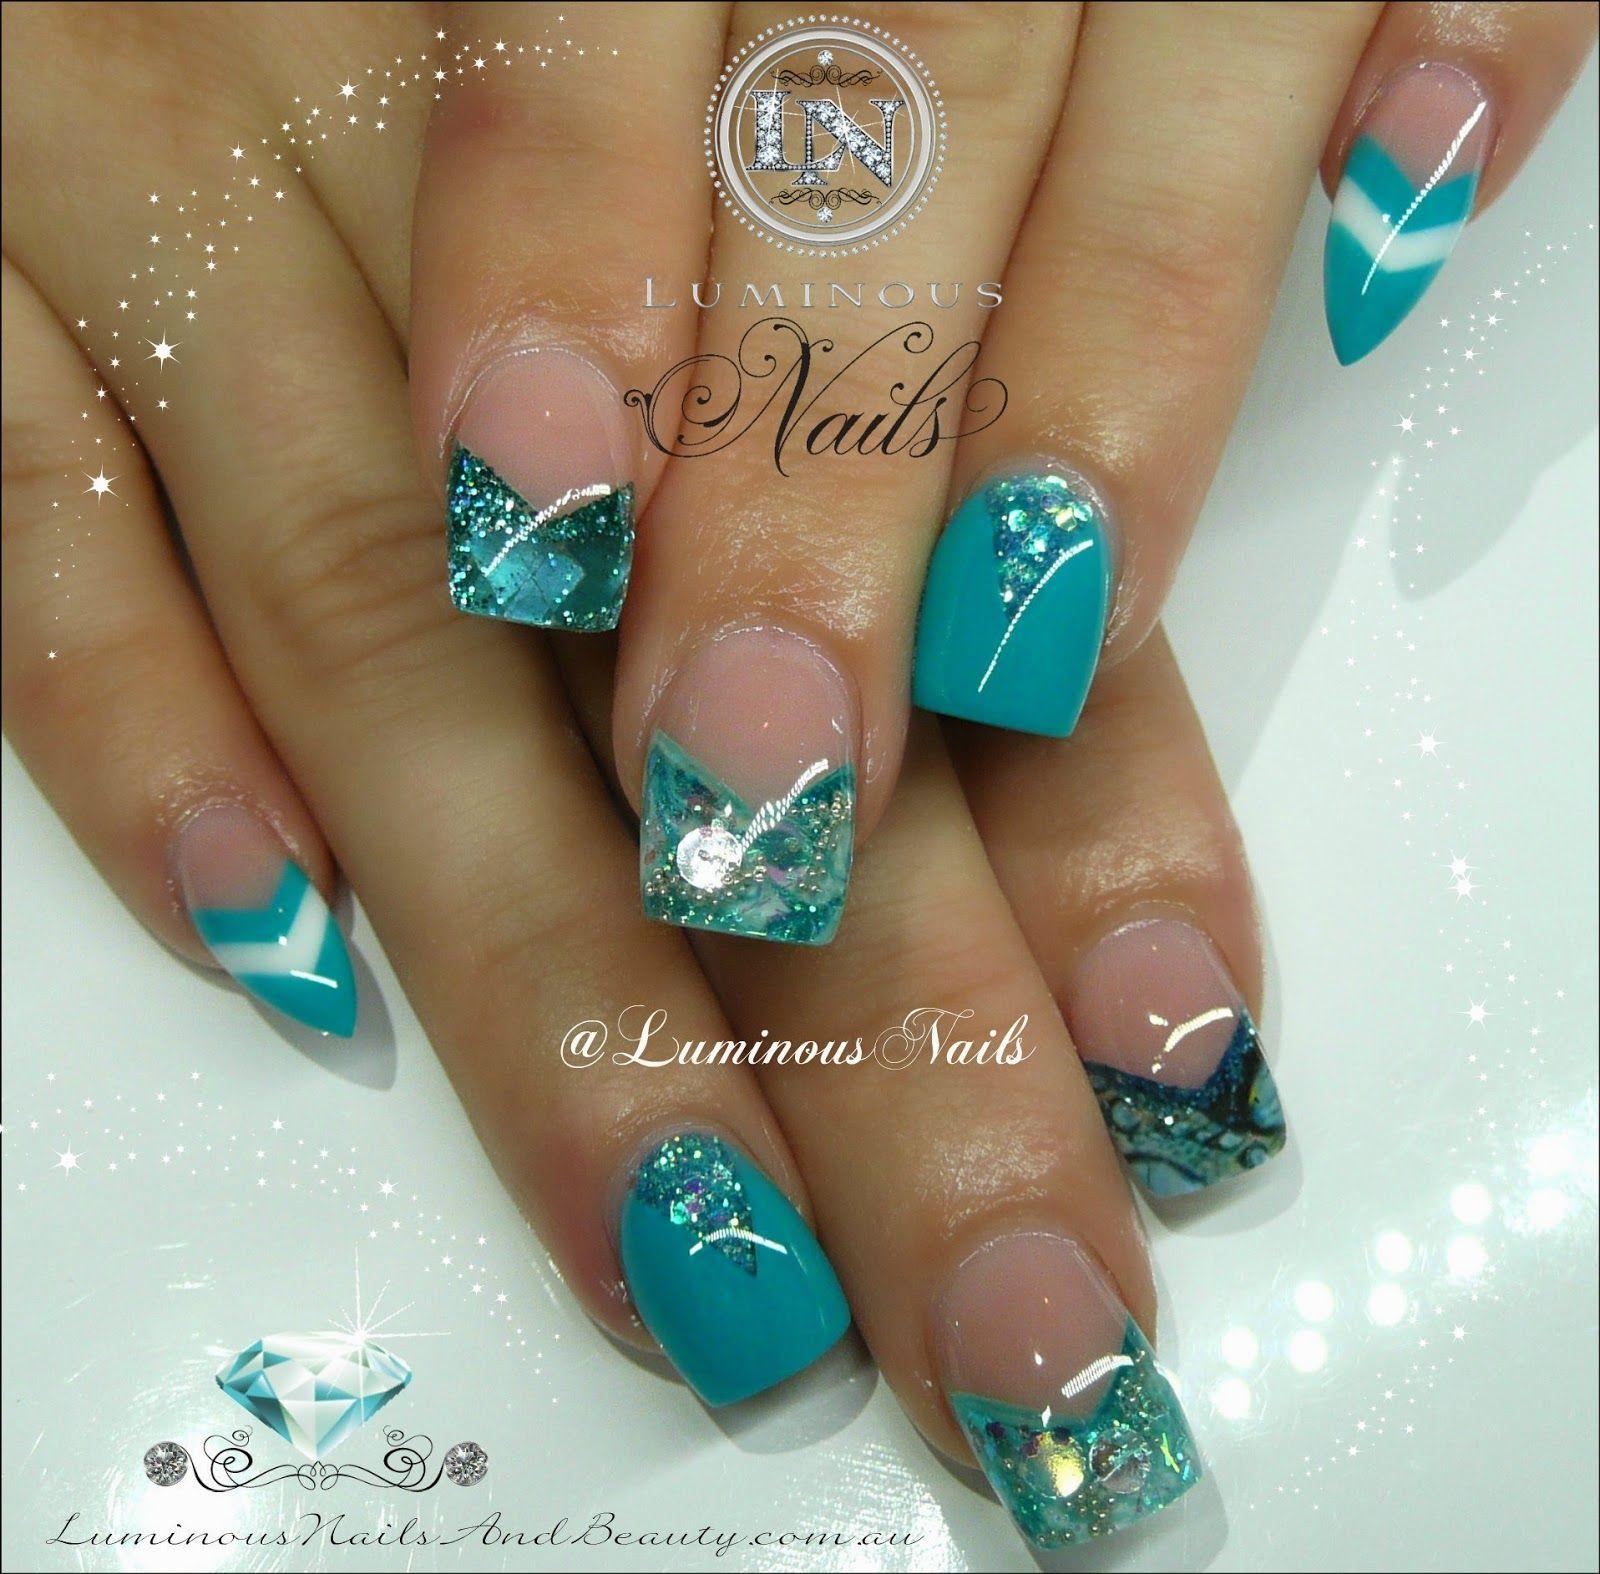 Luminous Nails: Gorgeous Turquoise Nails... | nails | Pinterest